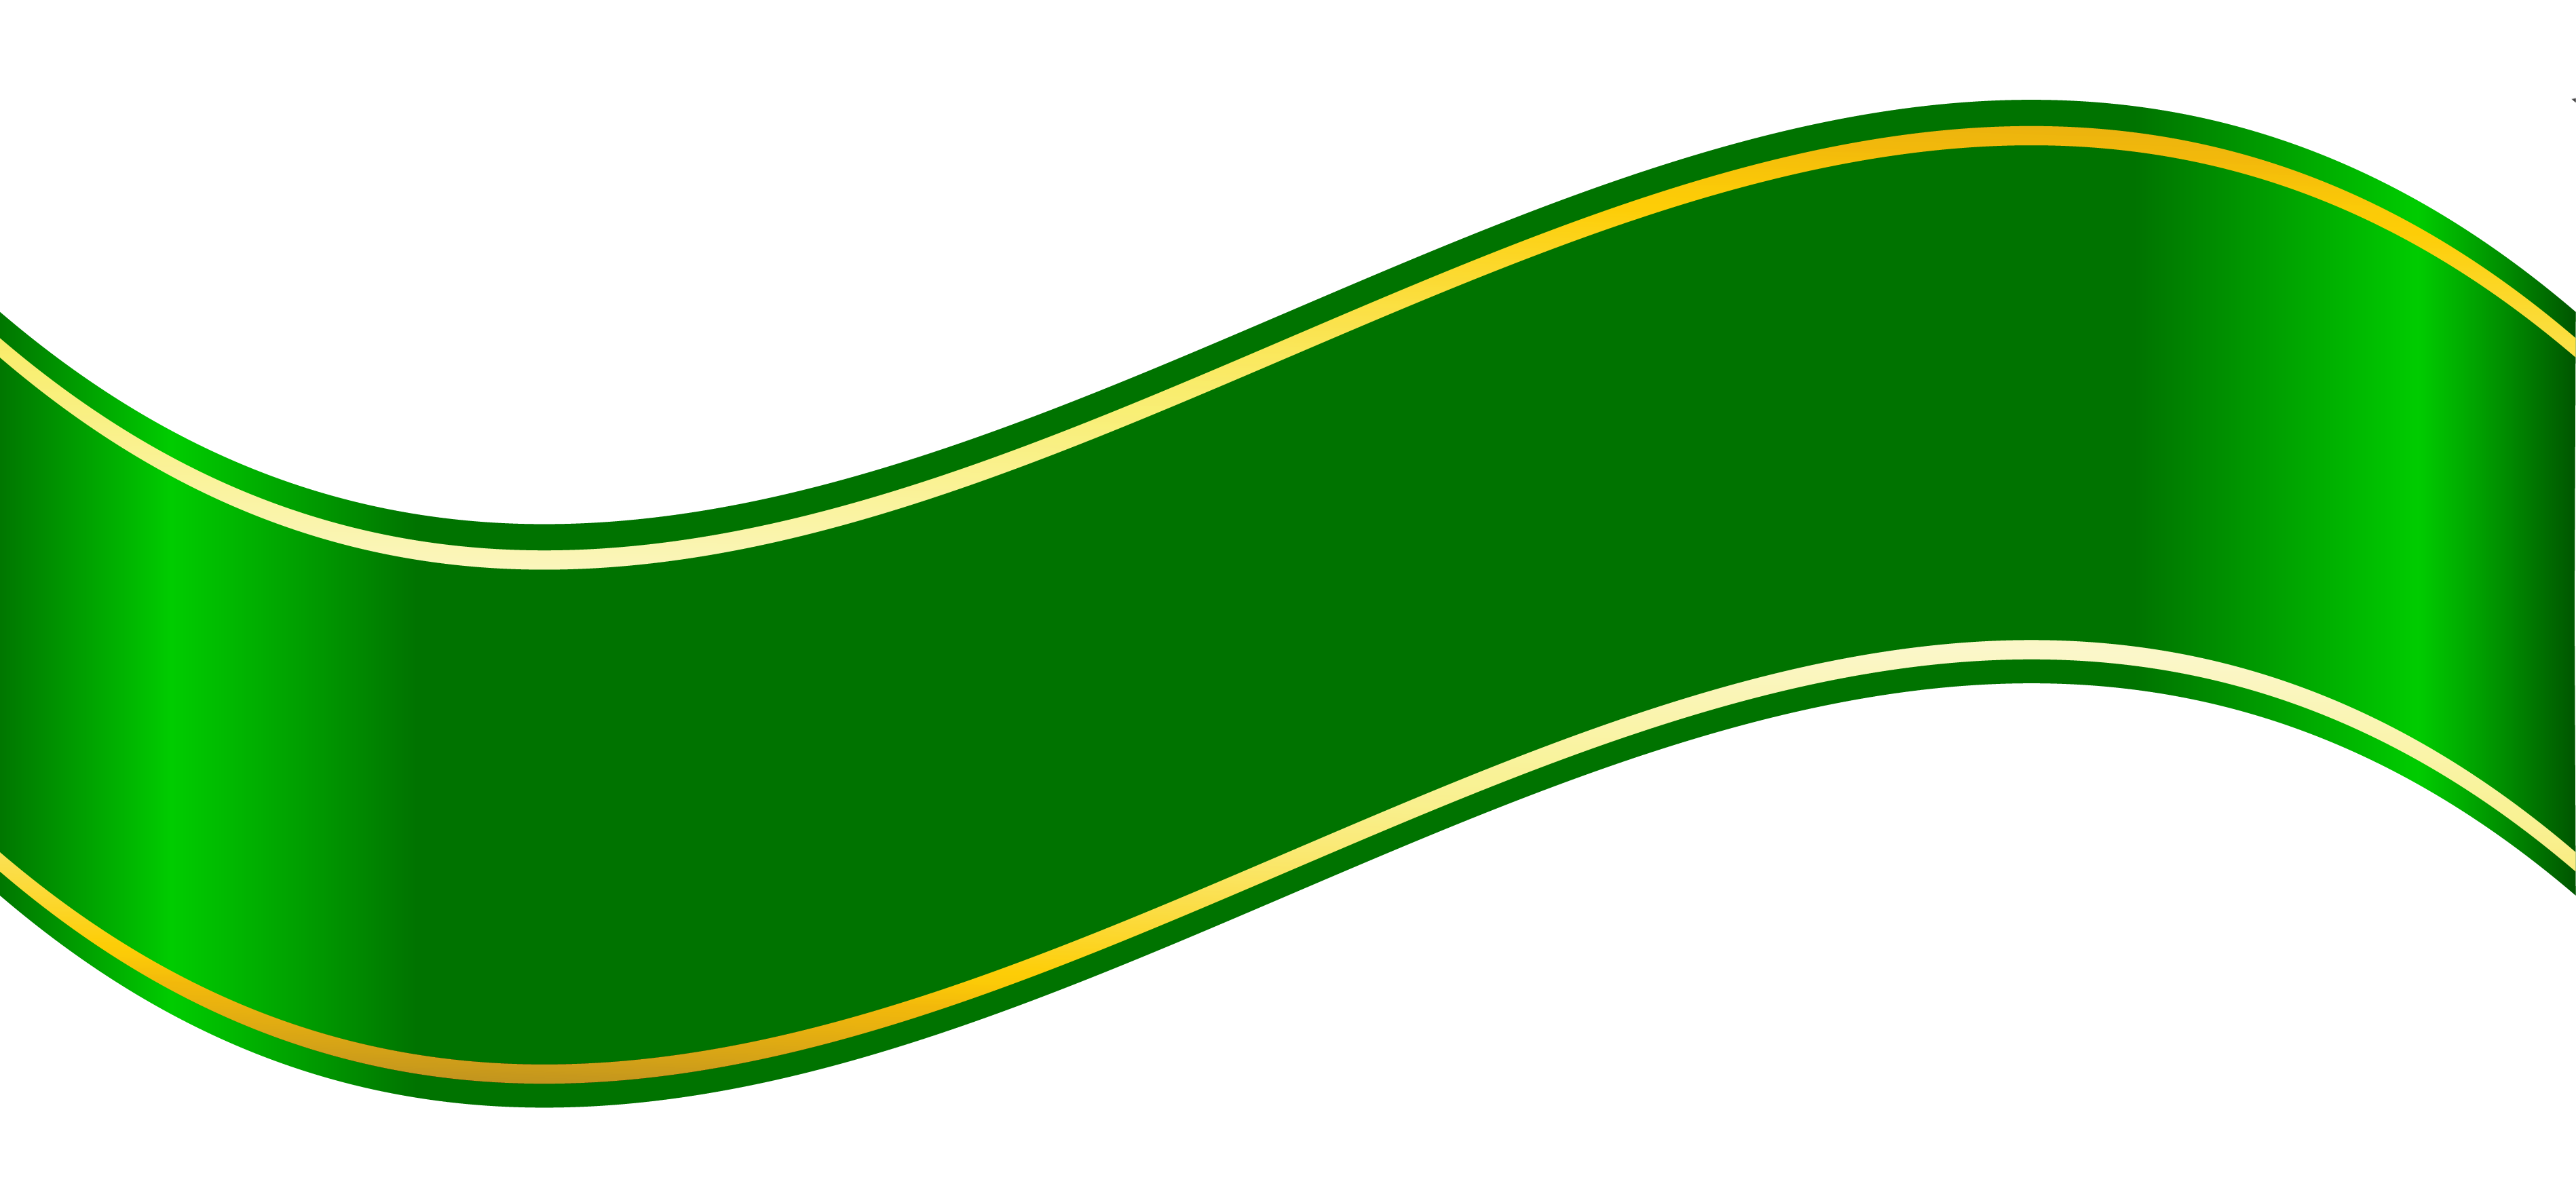 Green clipart banner. Logo brand car automotive